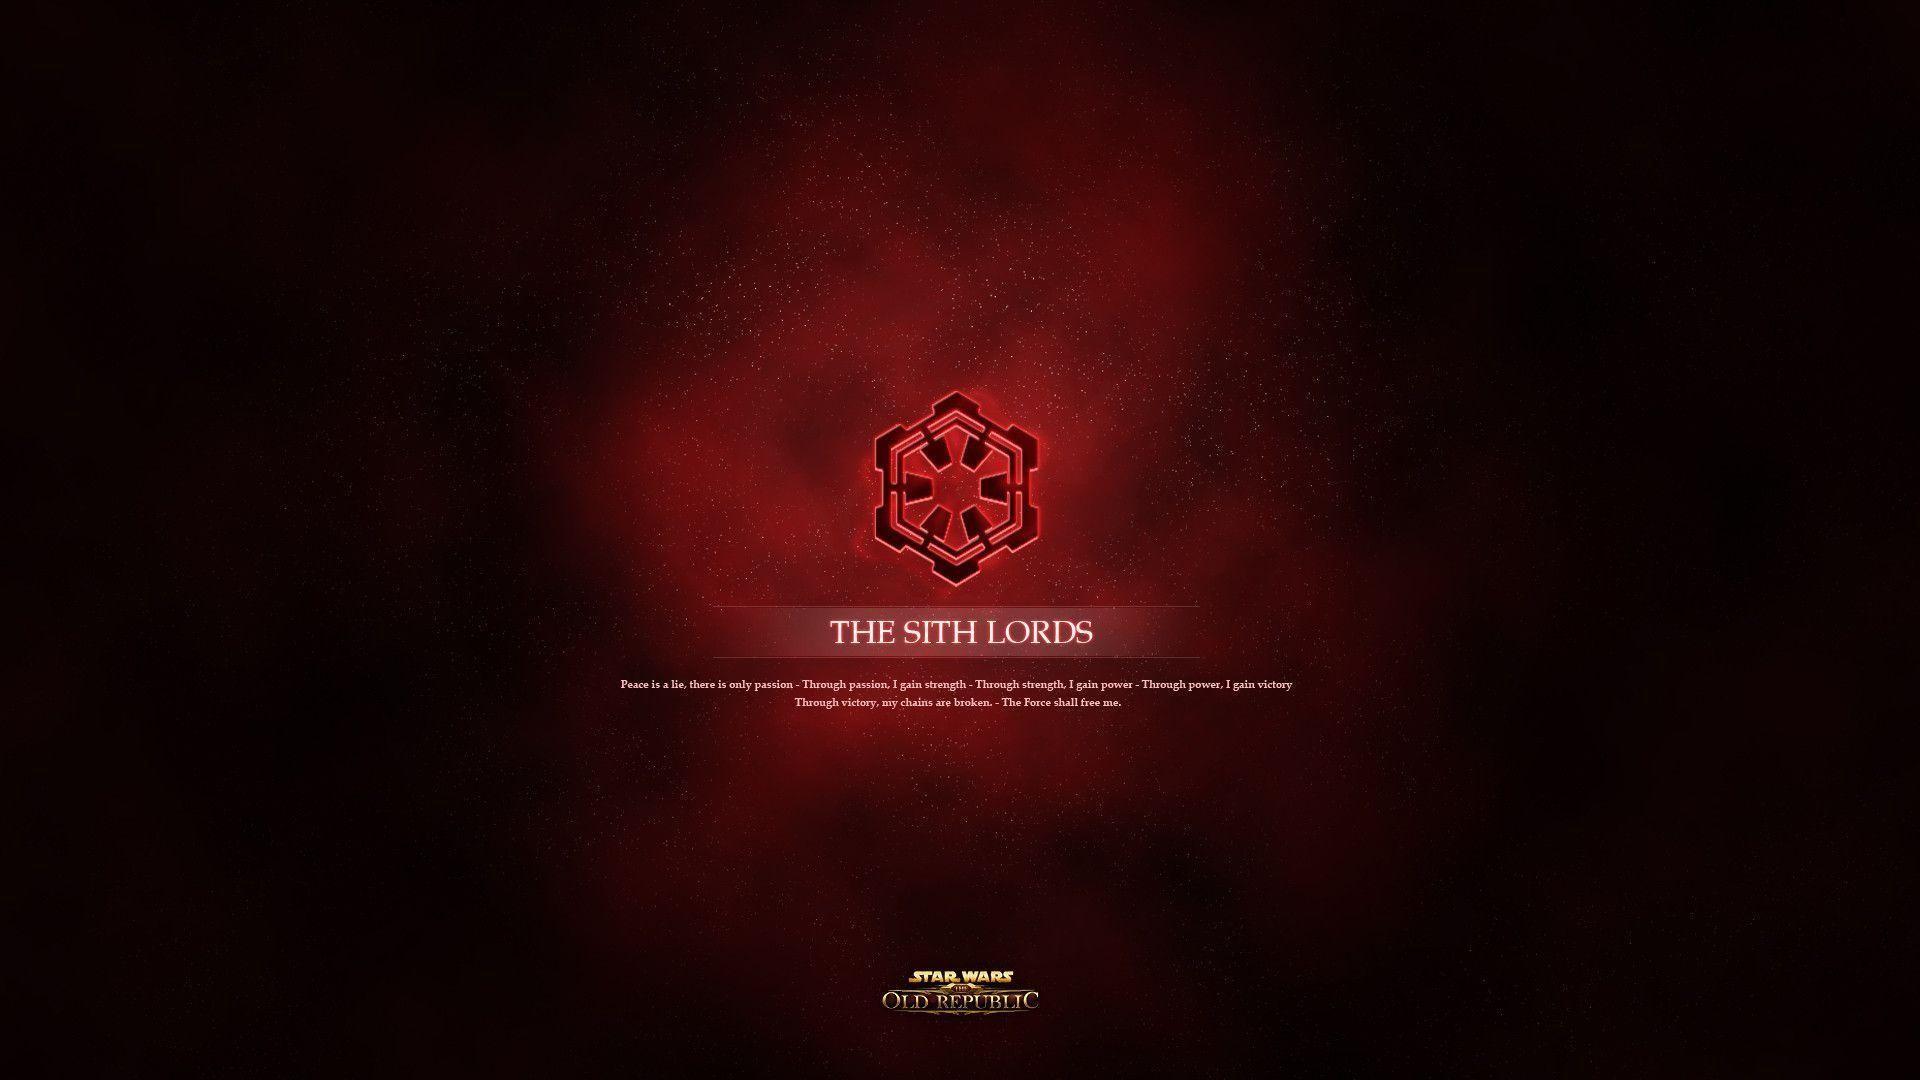 Sith Emblem Wallpaper Images – Reverse Search